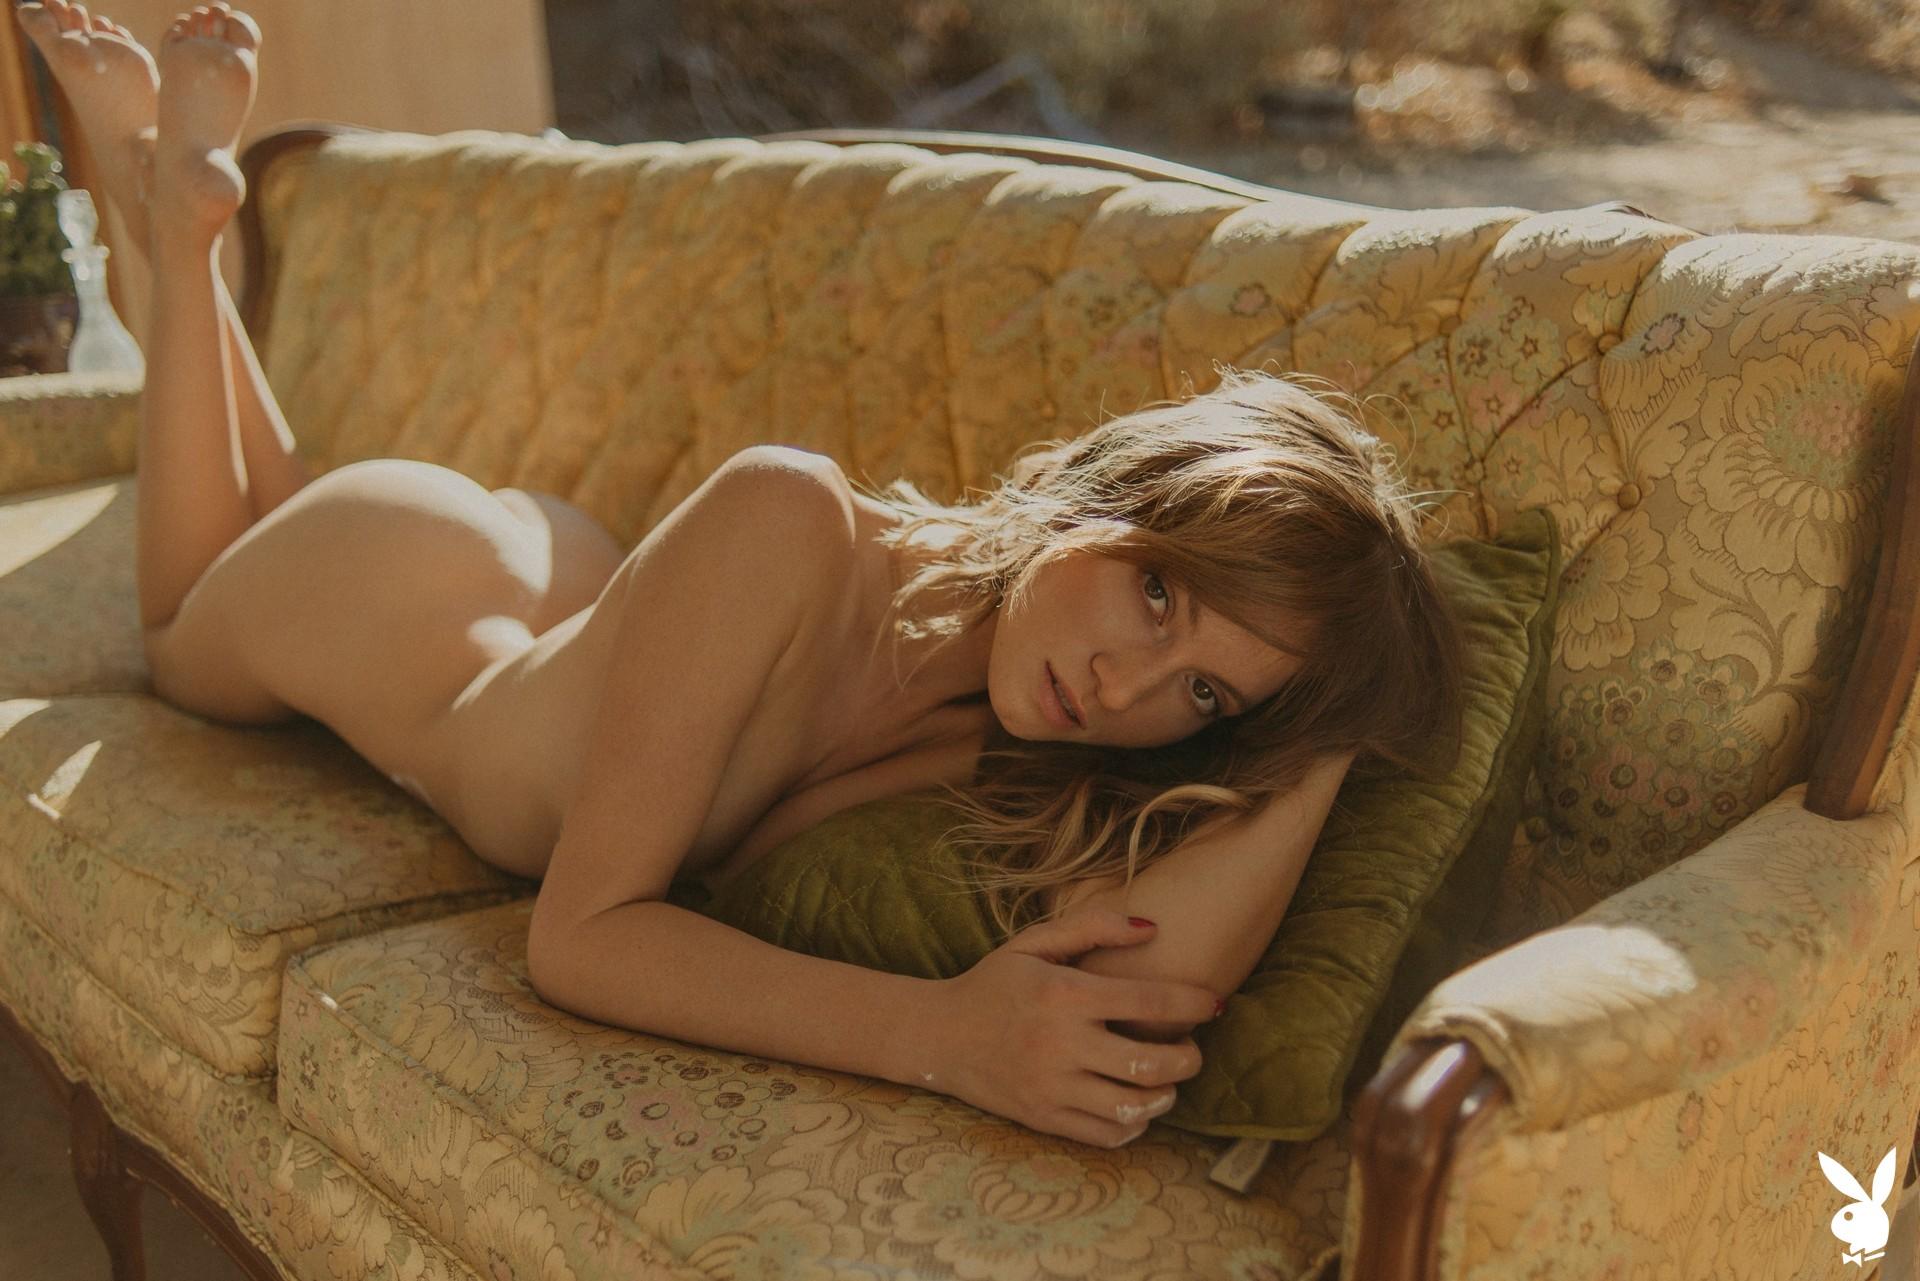 Nastasia Celeste In Creative Space Playboy Plus (31)